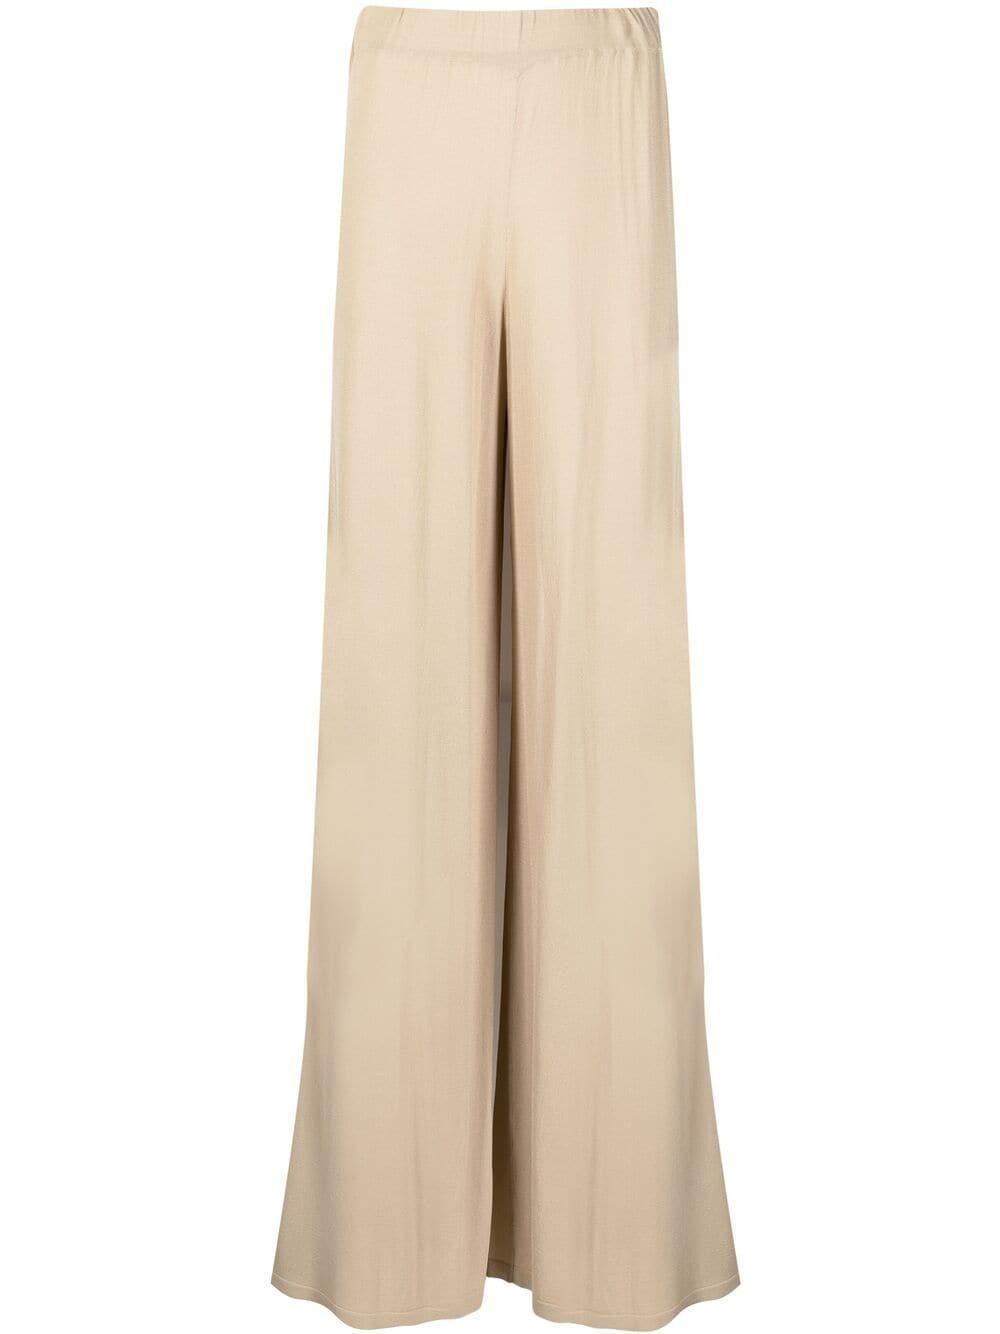 Pantaloni beige a vita alta a gamba larga con design drappeggiato P.A.R.O.S.H. | Pantaloni | D570542-ROIBOS004